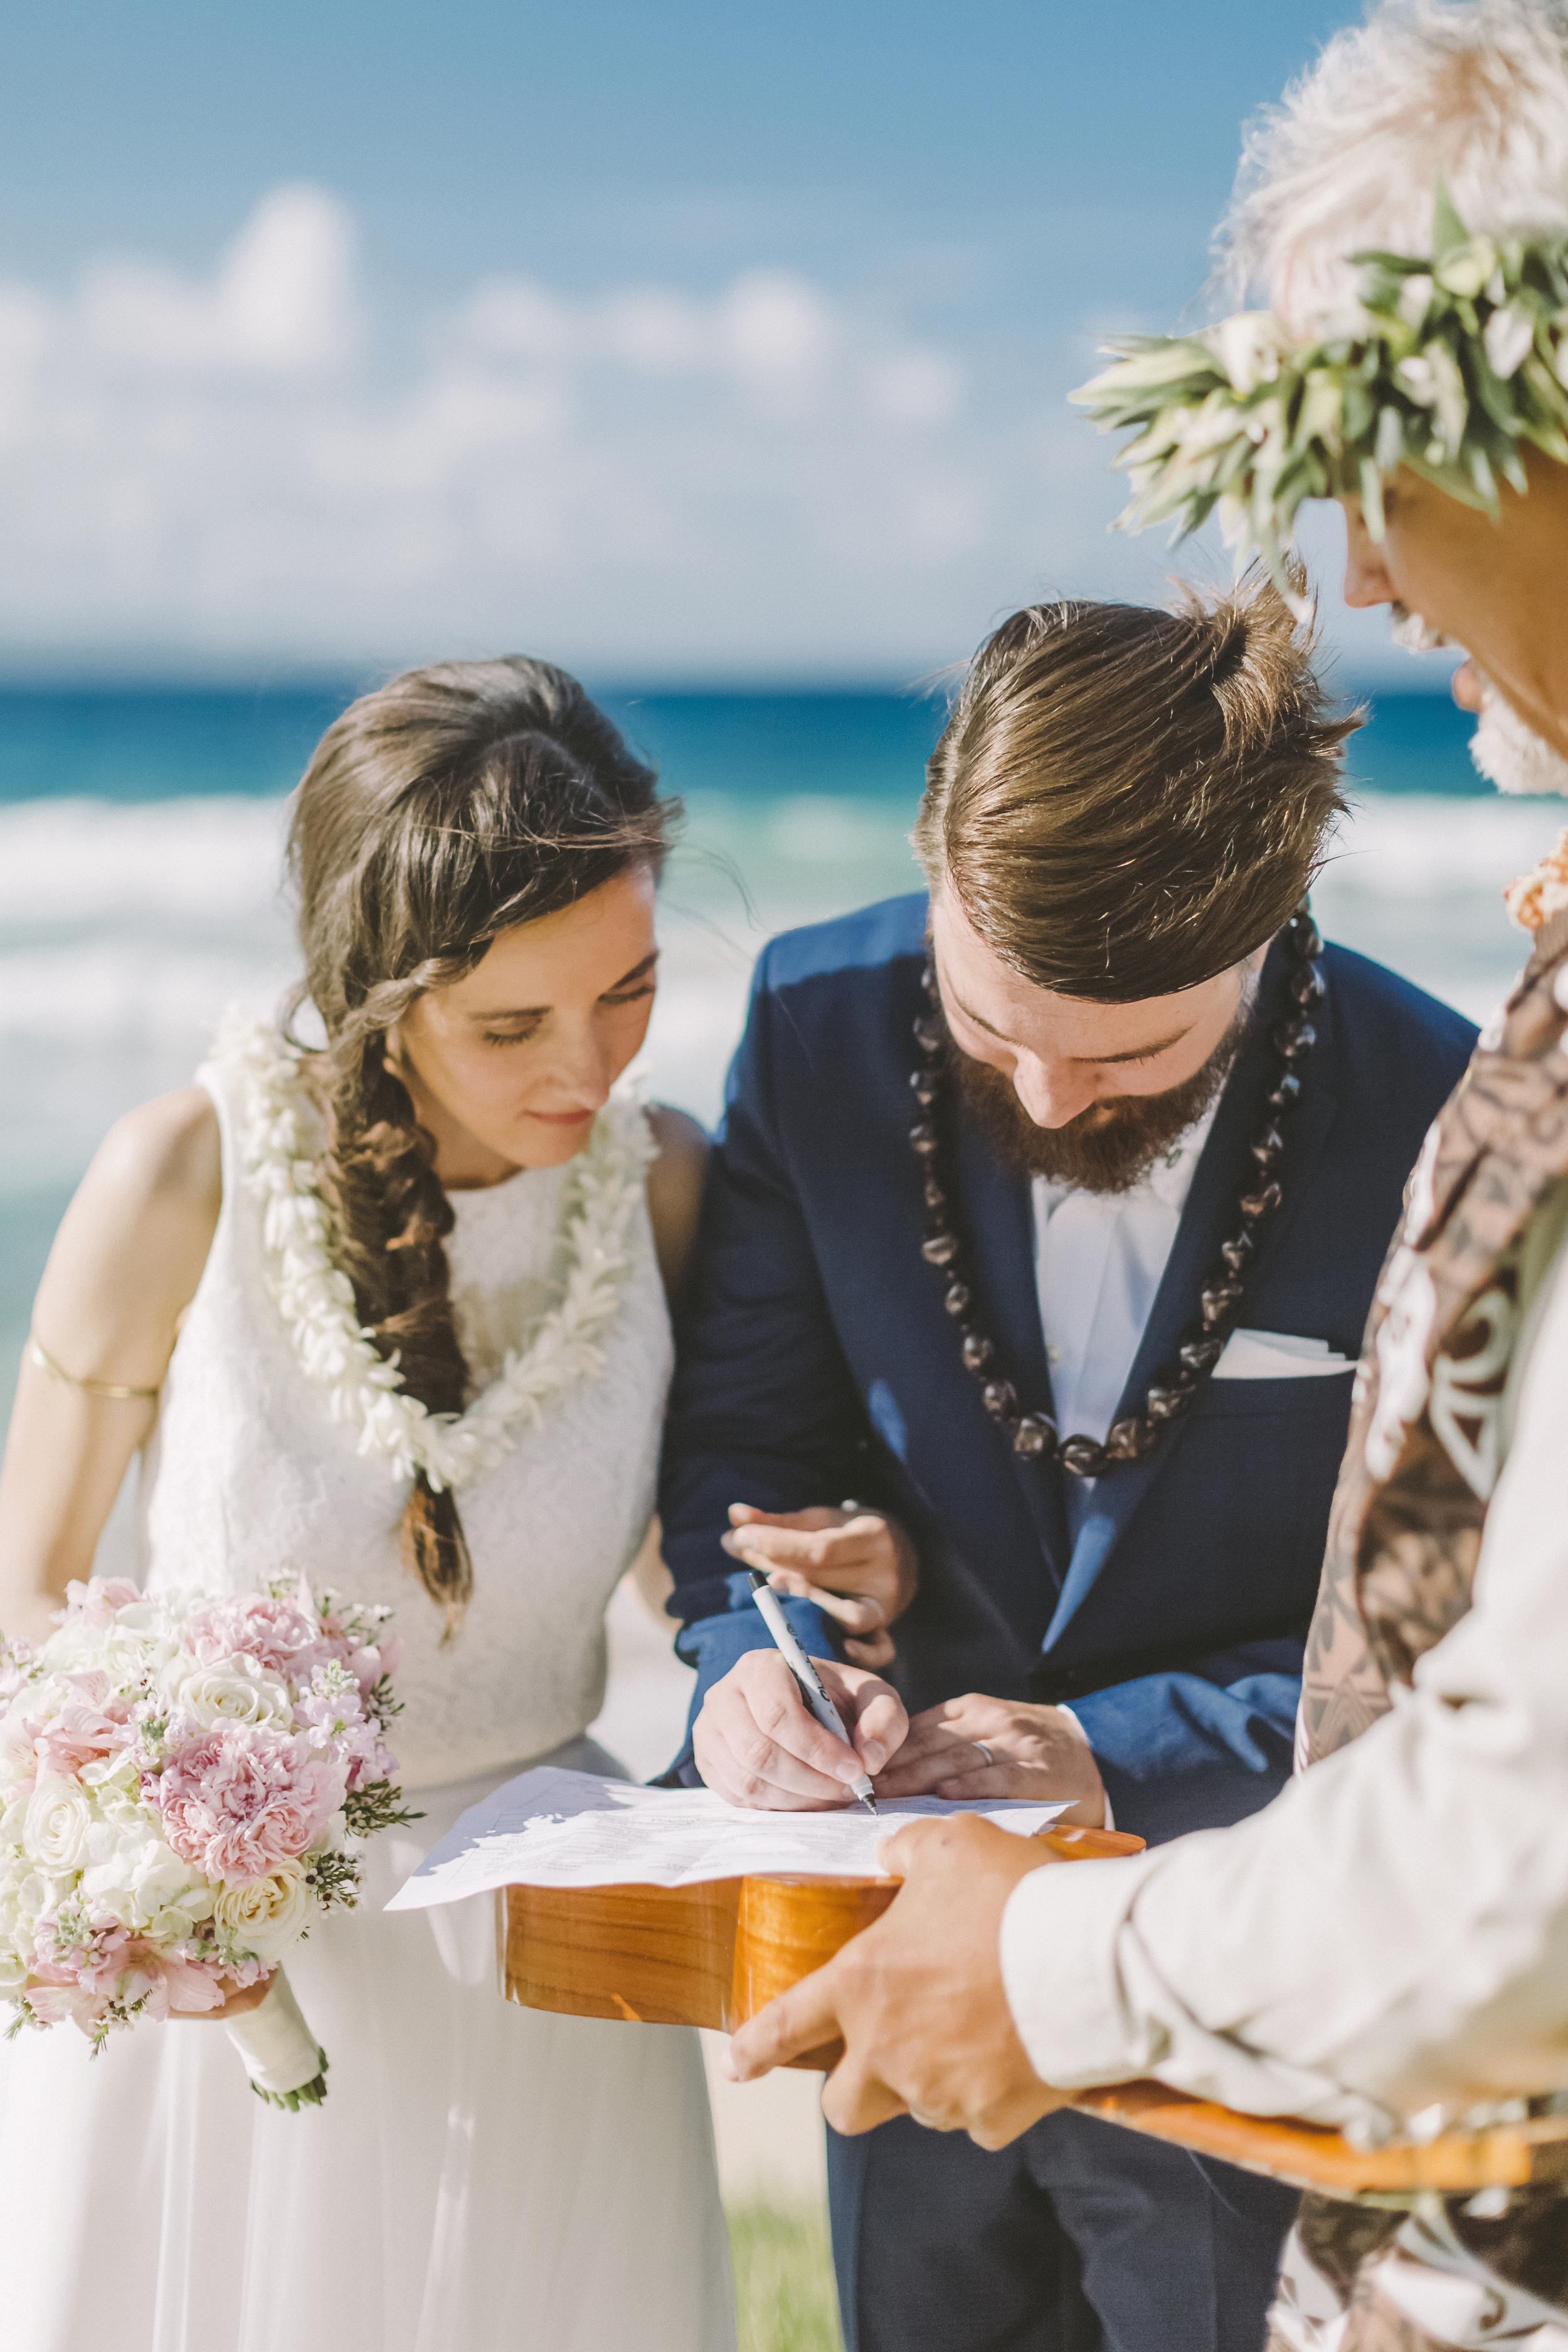 angie-diaz-photography-maui-wedding-ironwoods-beach-23.jpg